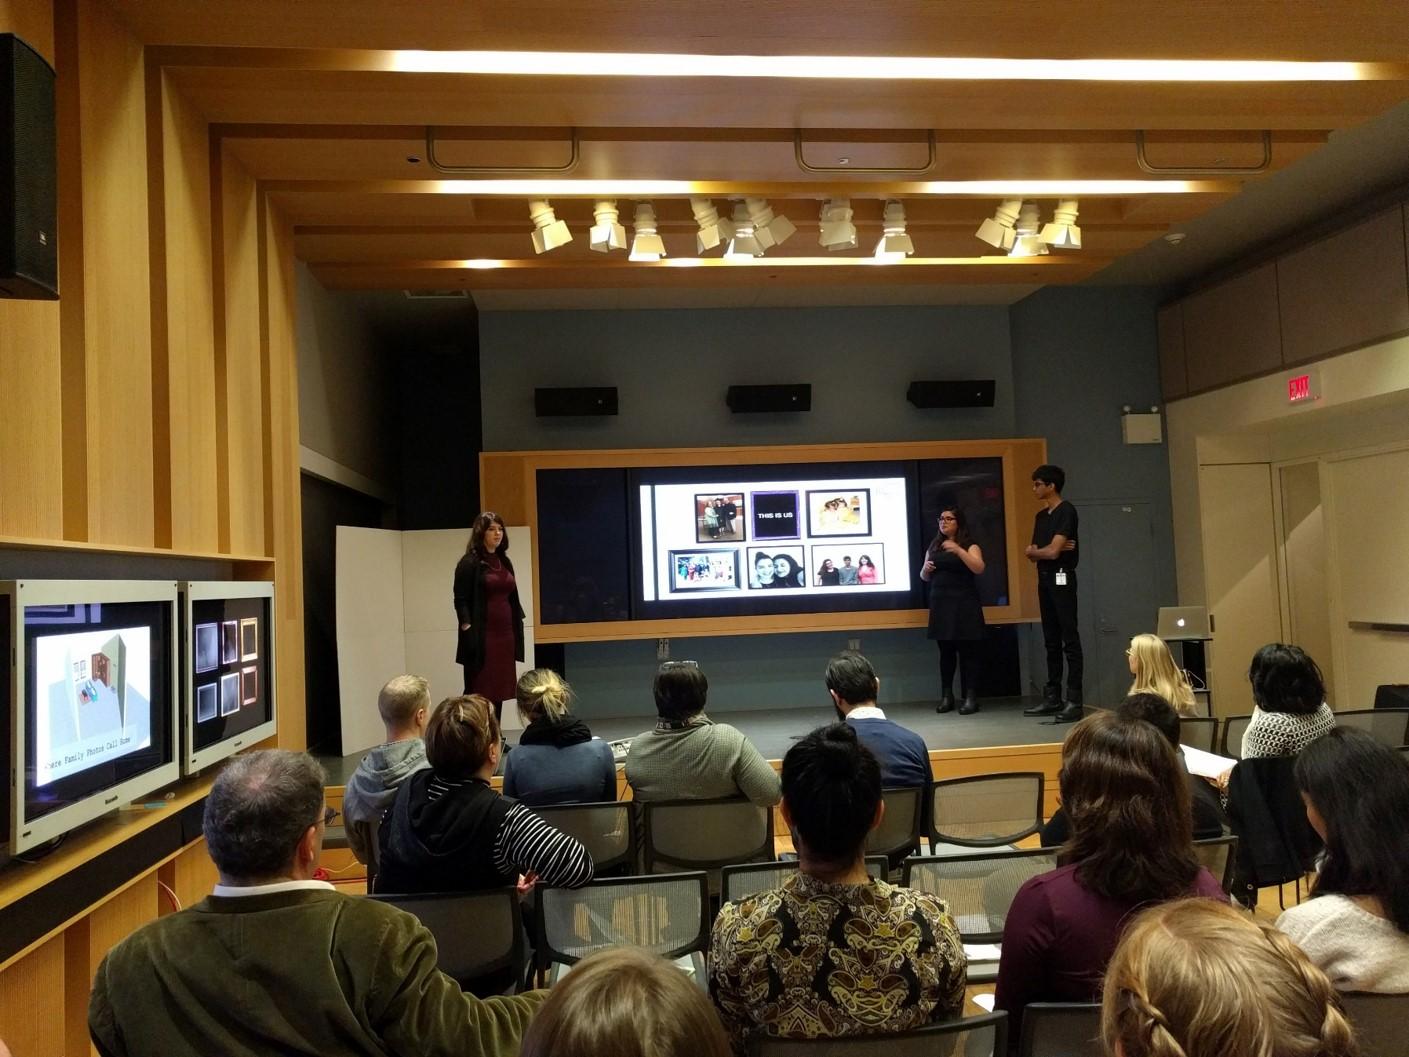 OCADU Digital Futures Student presentations at ROM (J. Orpana, 2016)